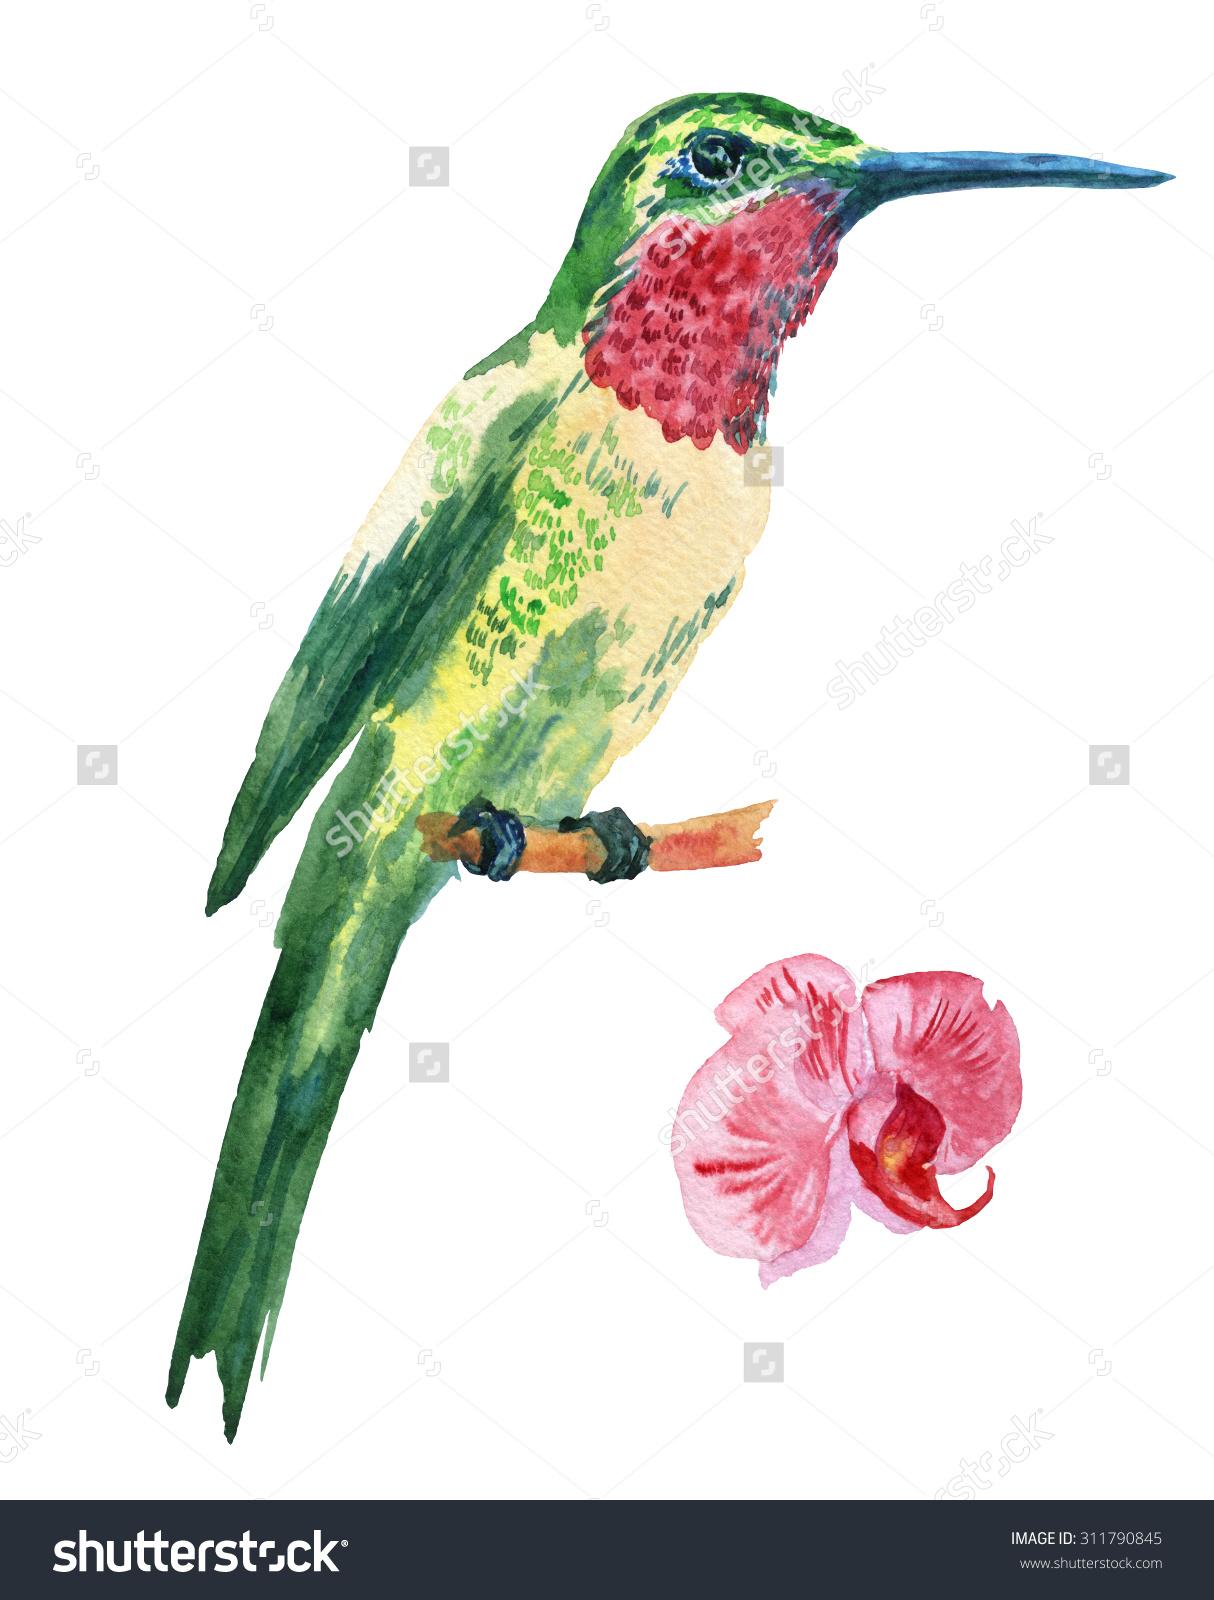 Realistic clipart ruby throated hummingbird #10